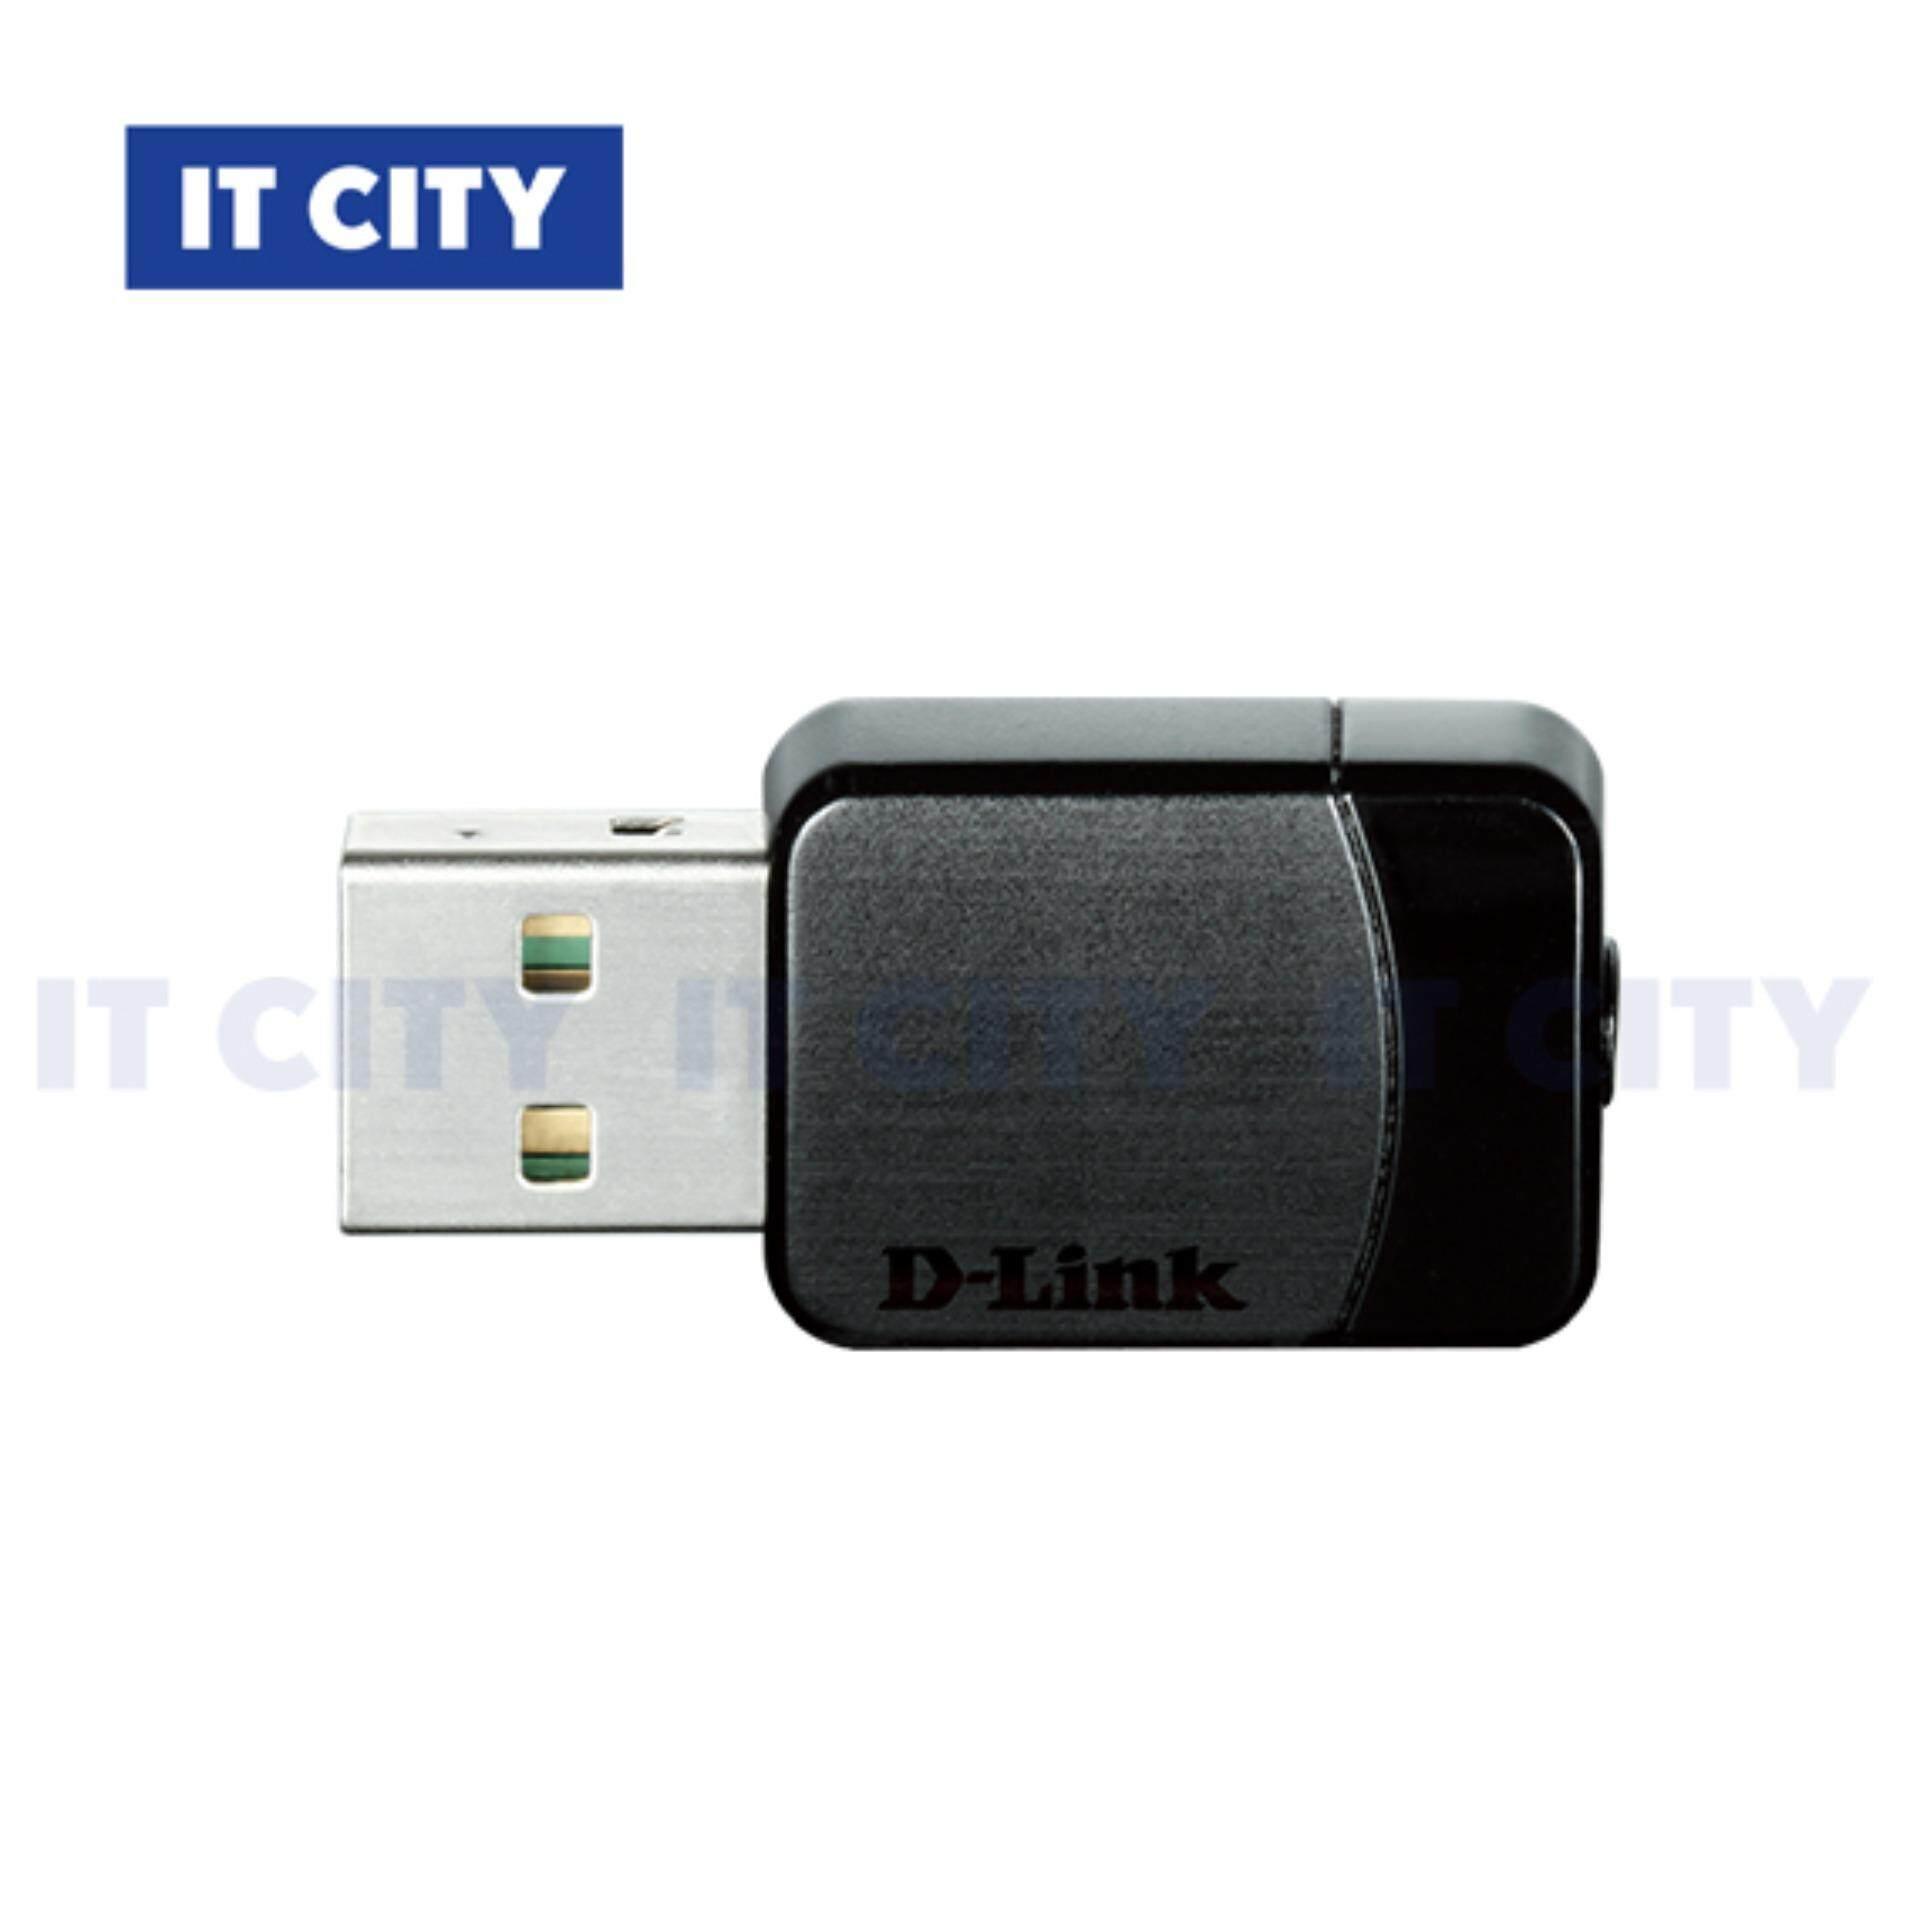 DRIVERS: COMPUSA WIRELESS LAN USB ADAPTER